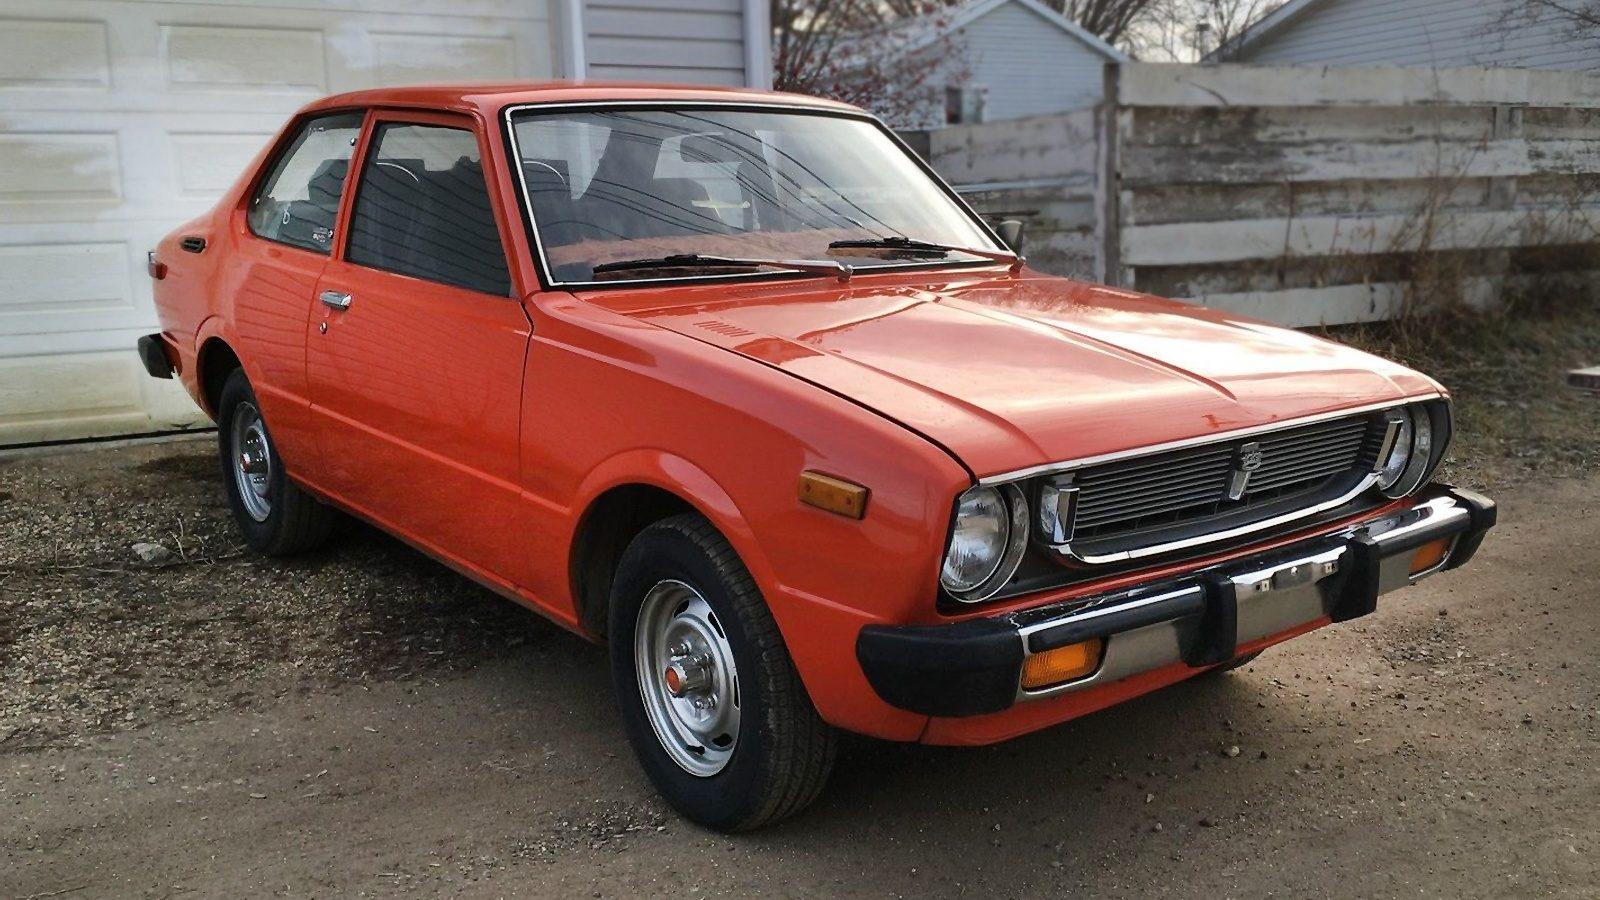 Orange You Glad 1976 Toyota Corolla Deluxe